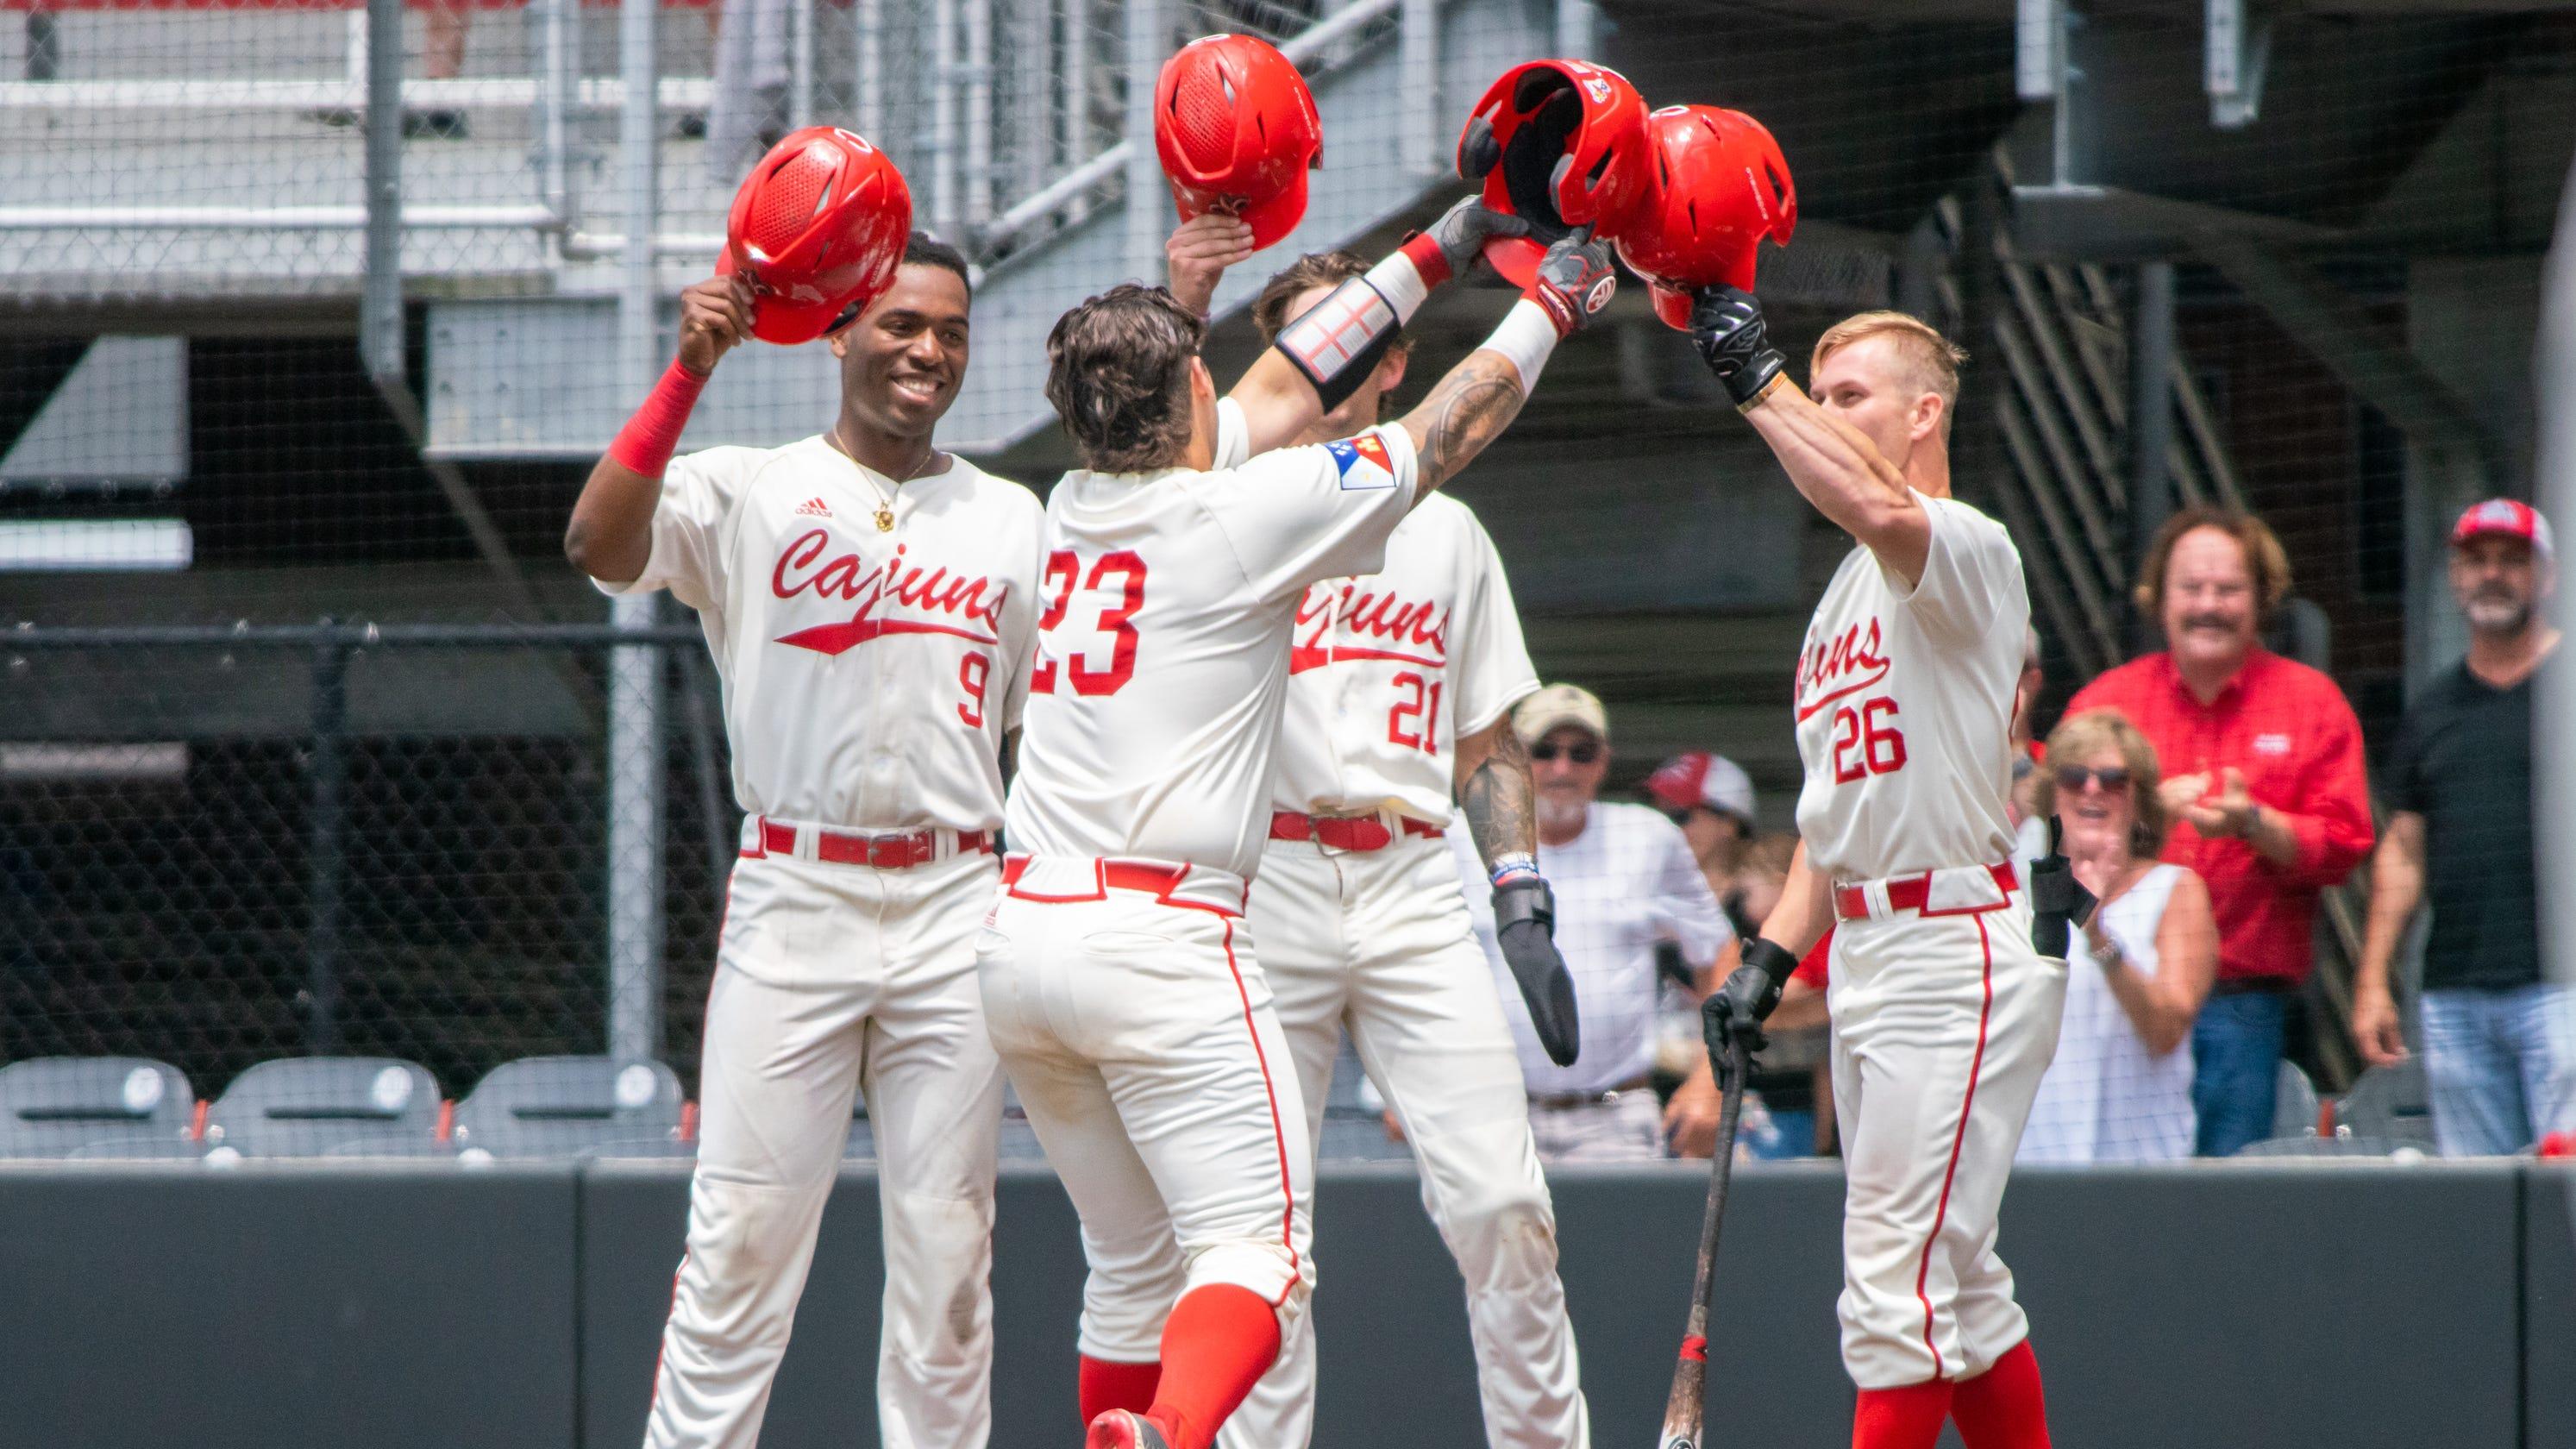 c167c635 UL baseball: Cajuns still need one win to ensure Sun Belt tourney spot